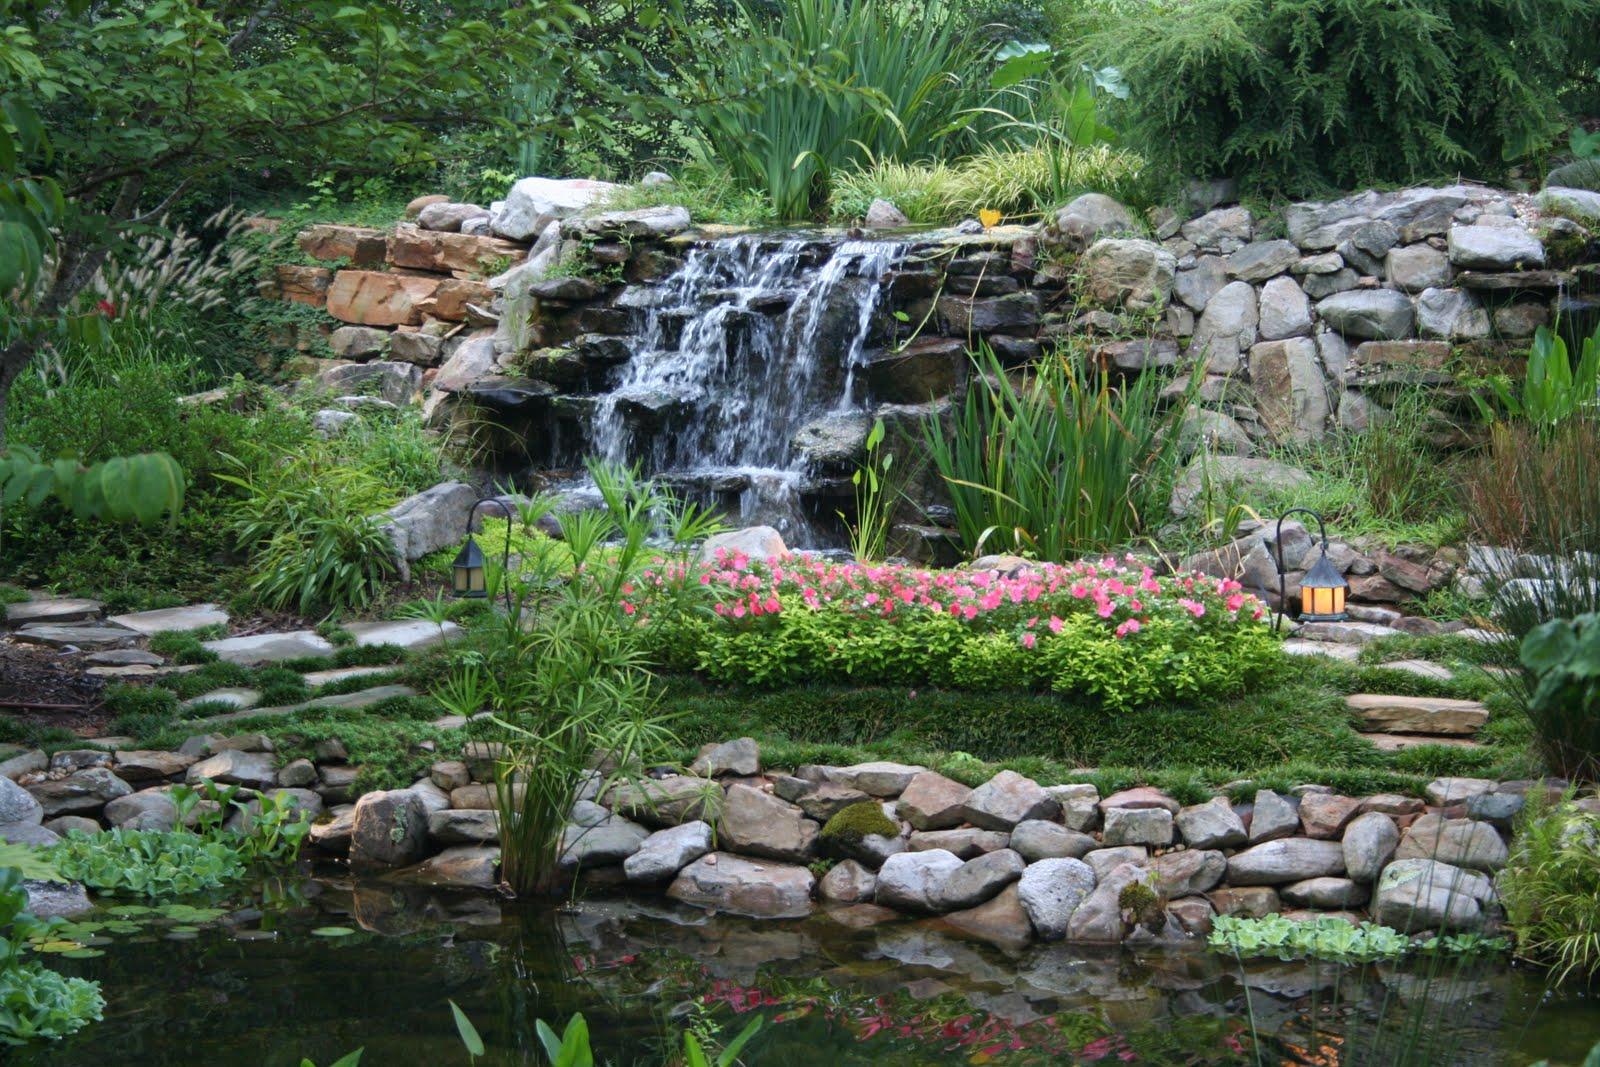 A chef in the garden august garden photos for Koi pond waterfall